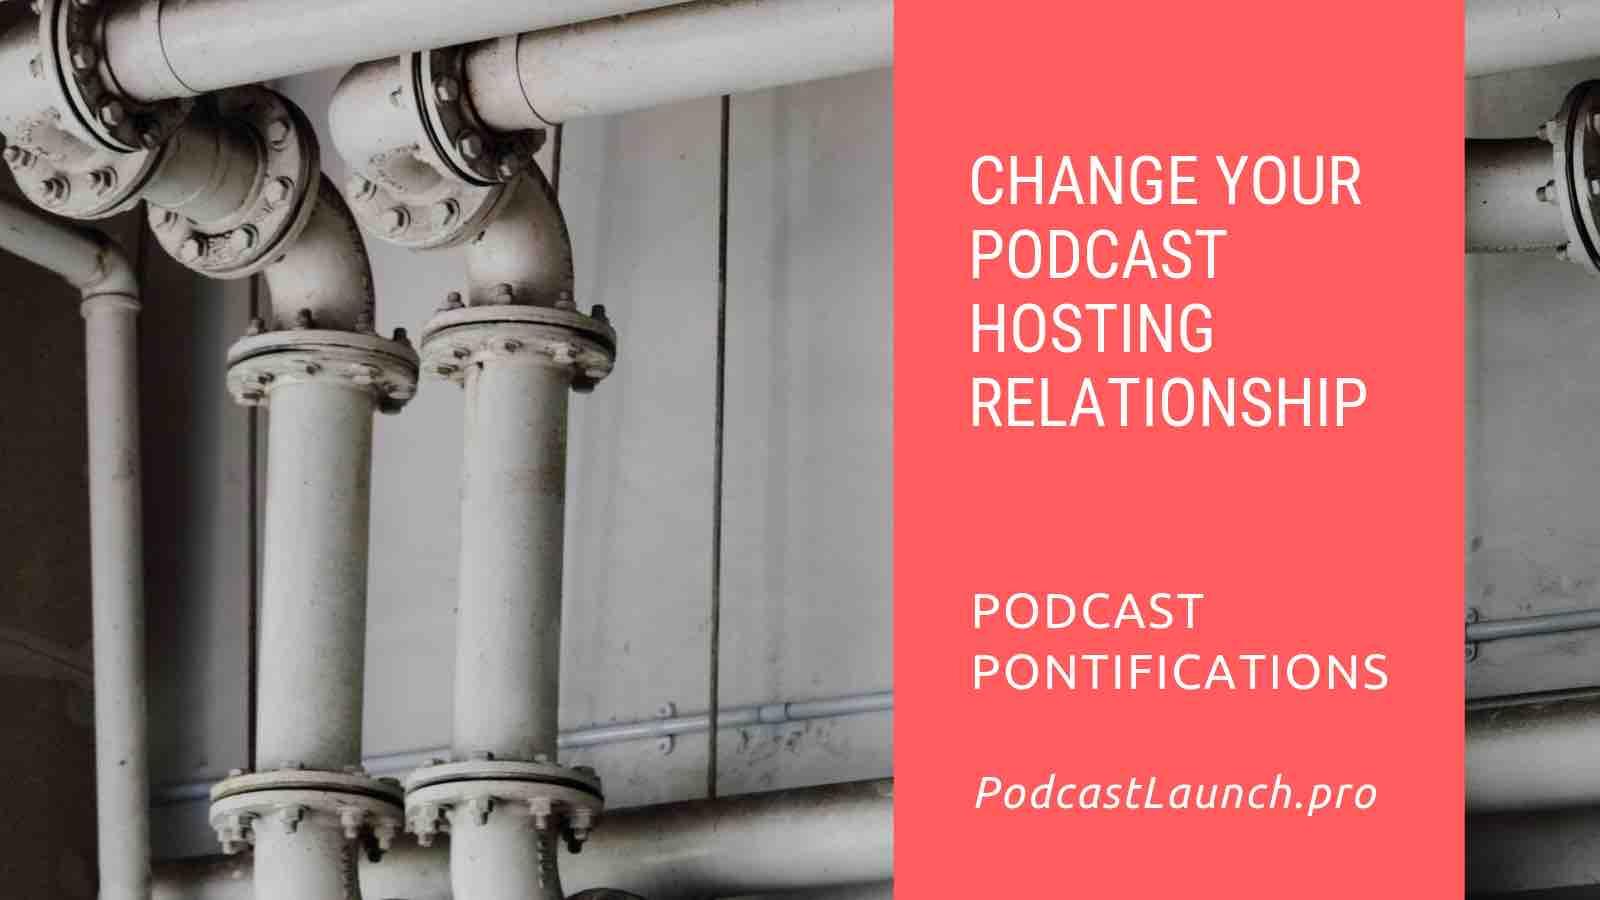 Change Your Podcast Hosting Relationship